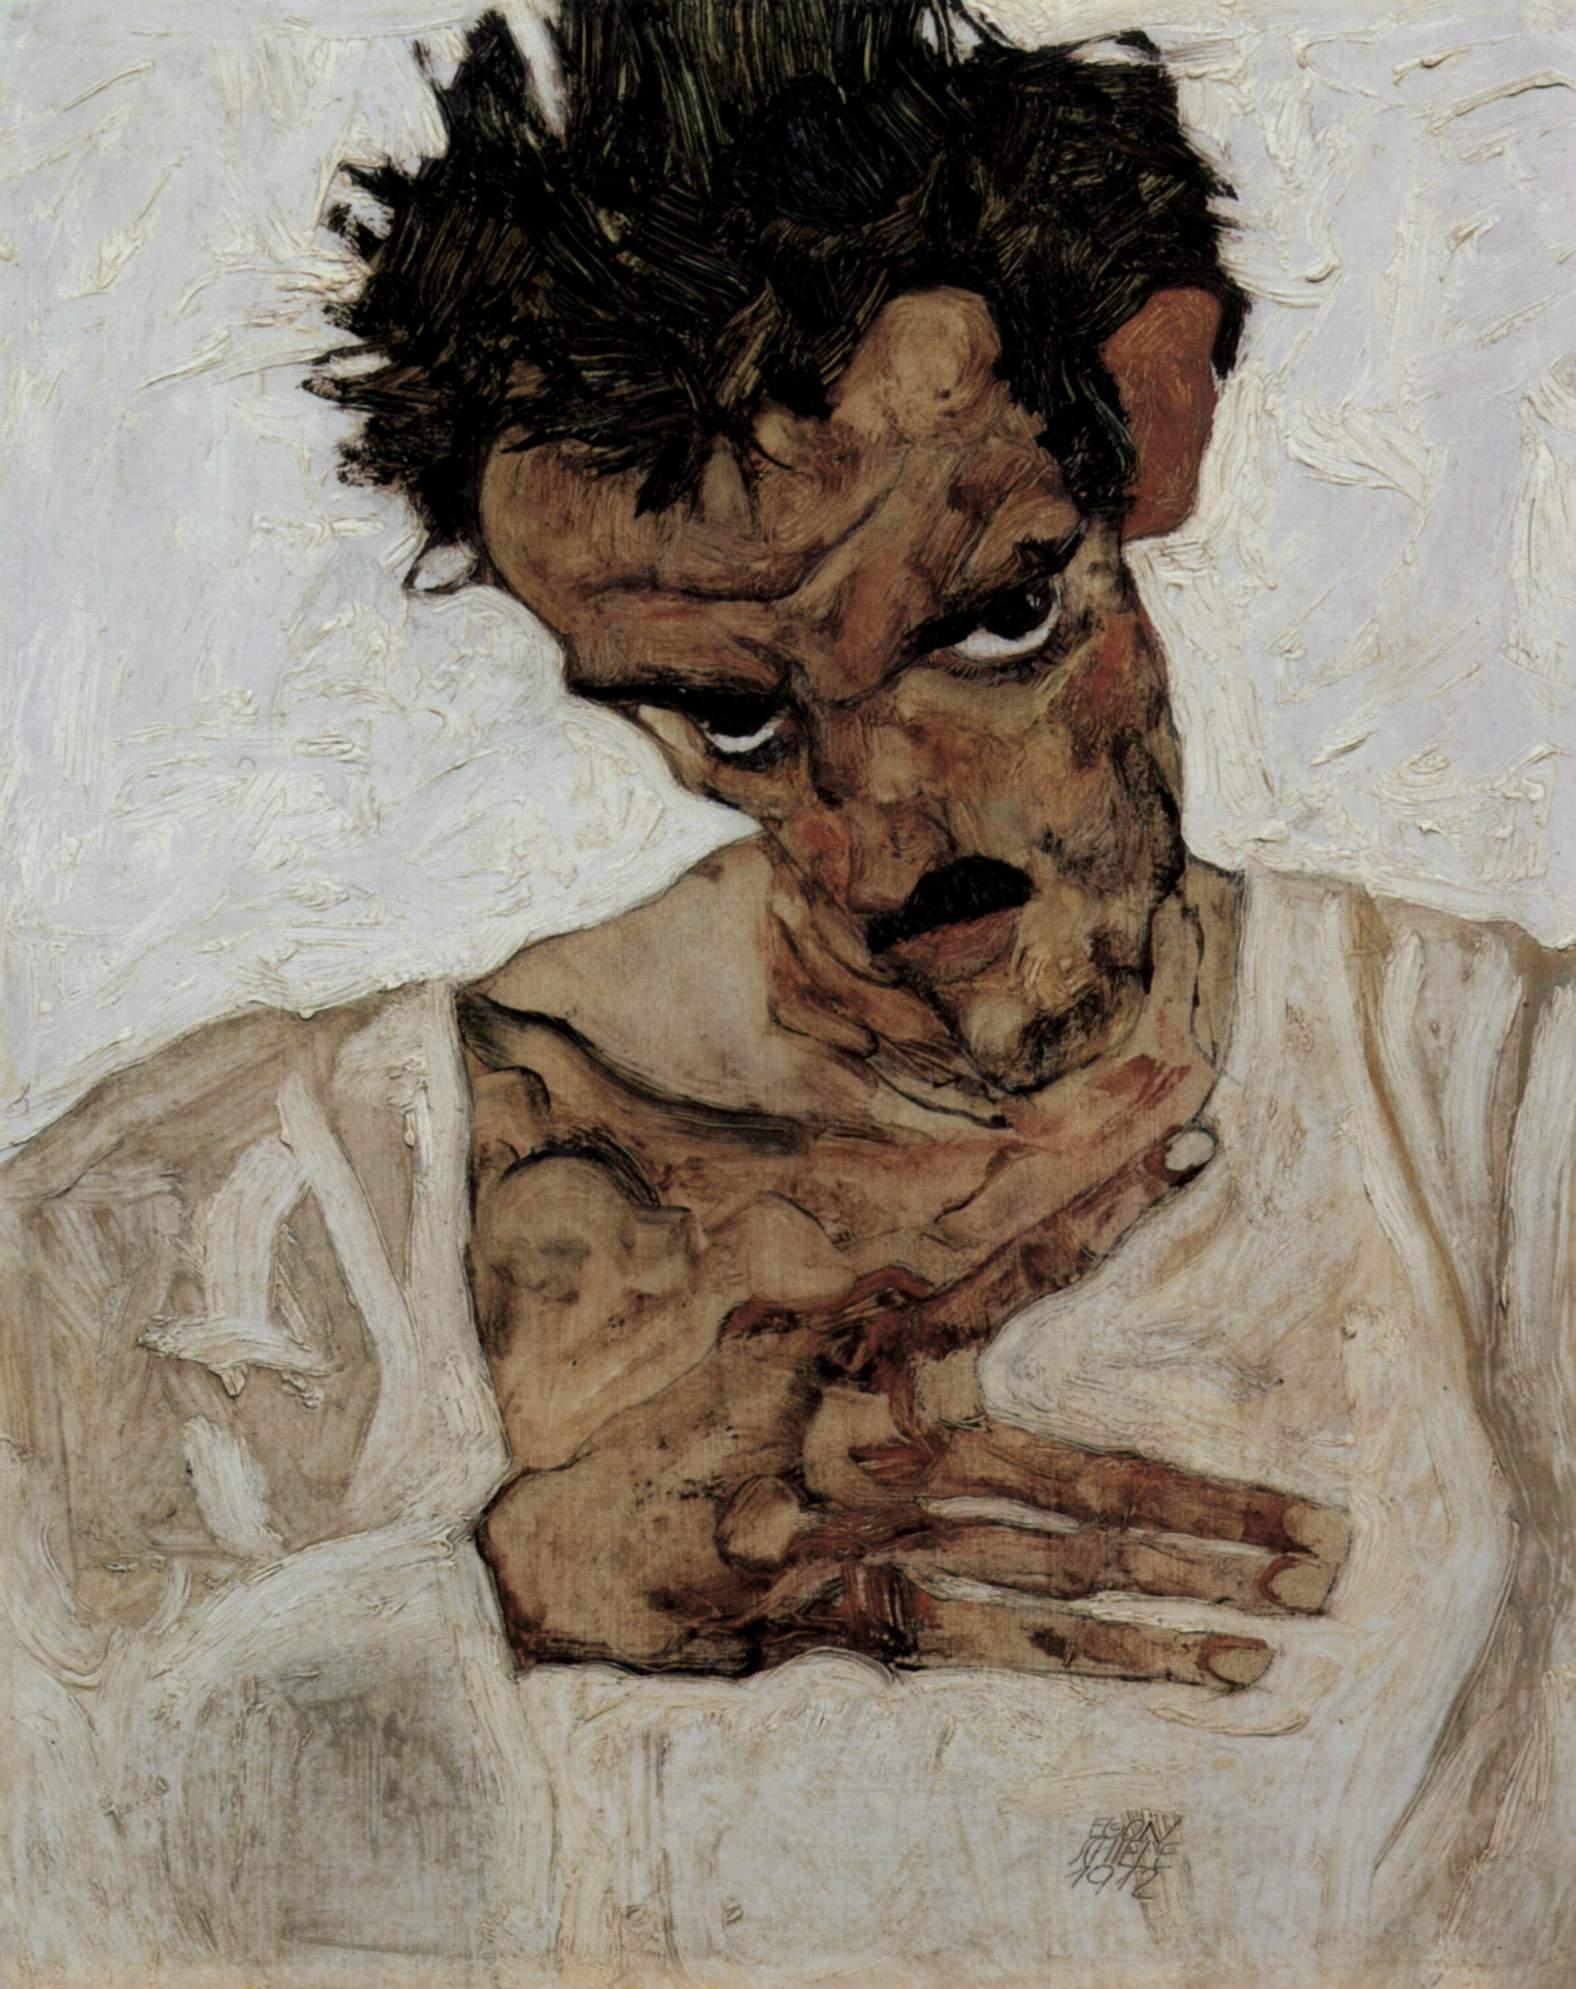 Self-Portrait, Egon Schiele,, 1912 (Image courtesy of Leopold Museum)